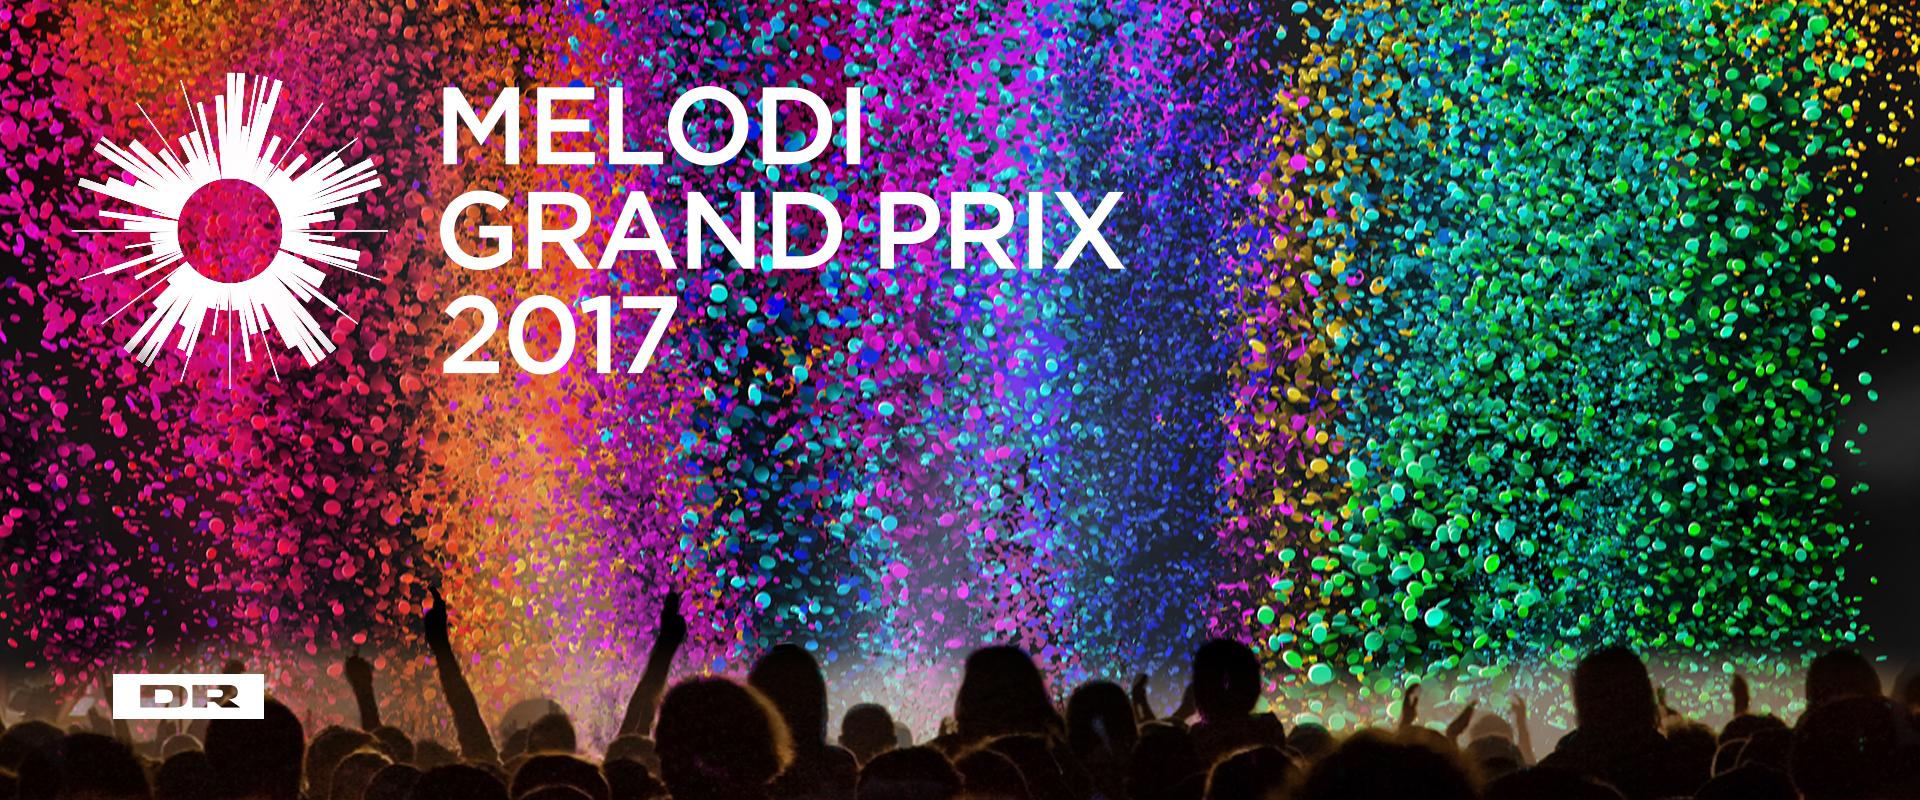 Denmark 2017: 10 Finalists for DANSK MELODI GRAND PRIX 2017